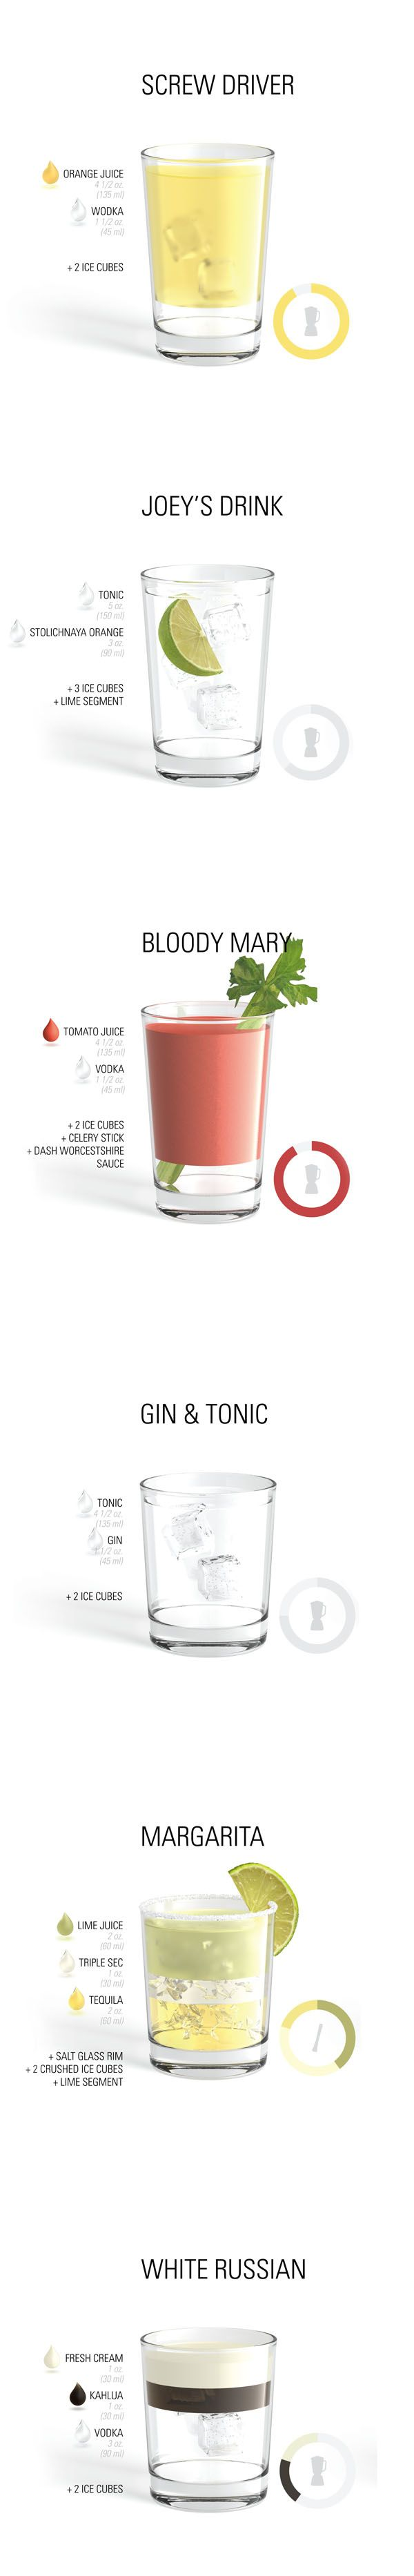 http://trendland.net/konstantin-datz-cocktail-poster-illustrations/konstantin-datz-cocktail-poster-11/